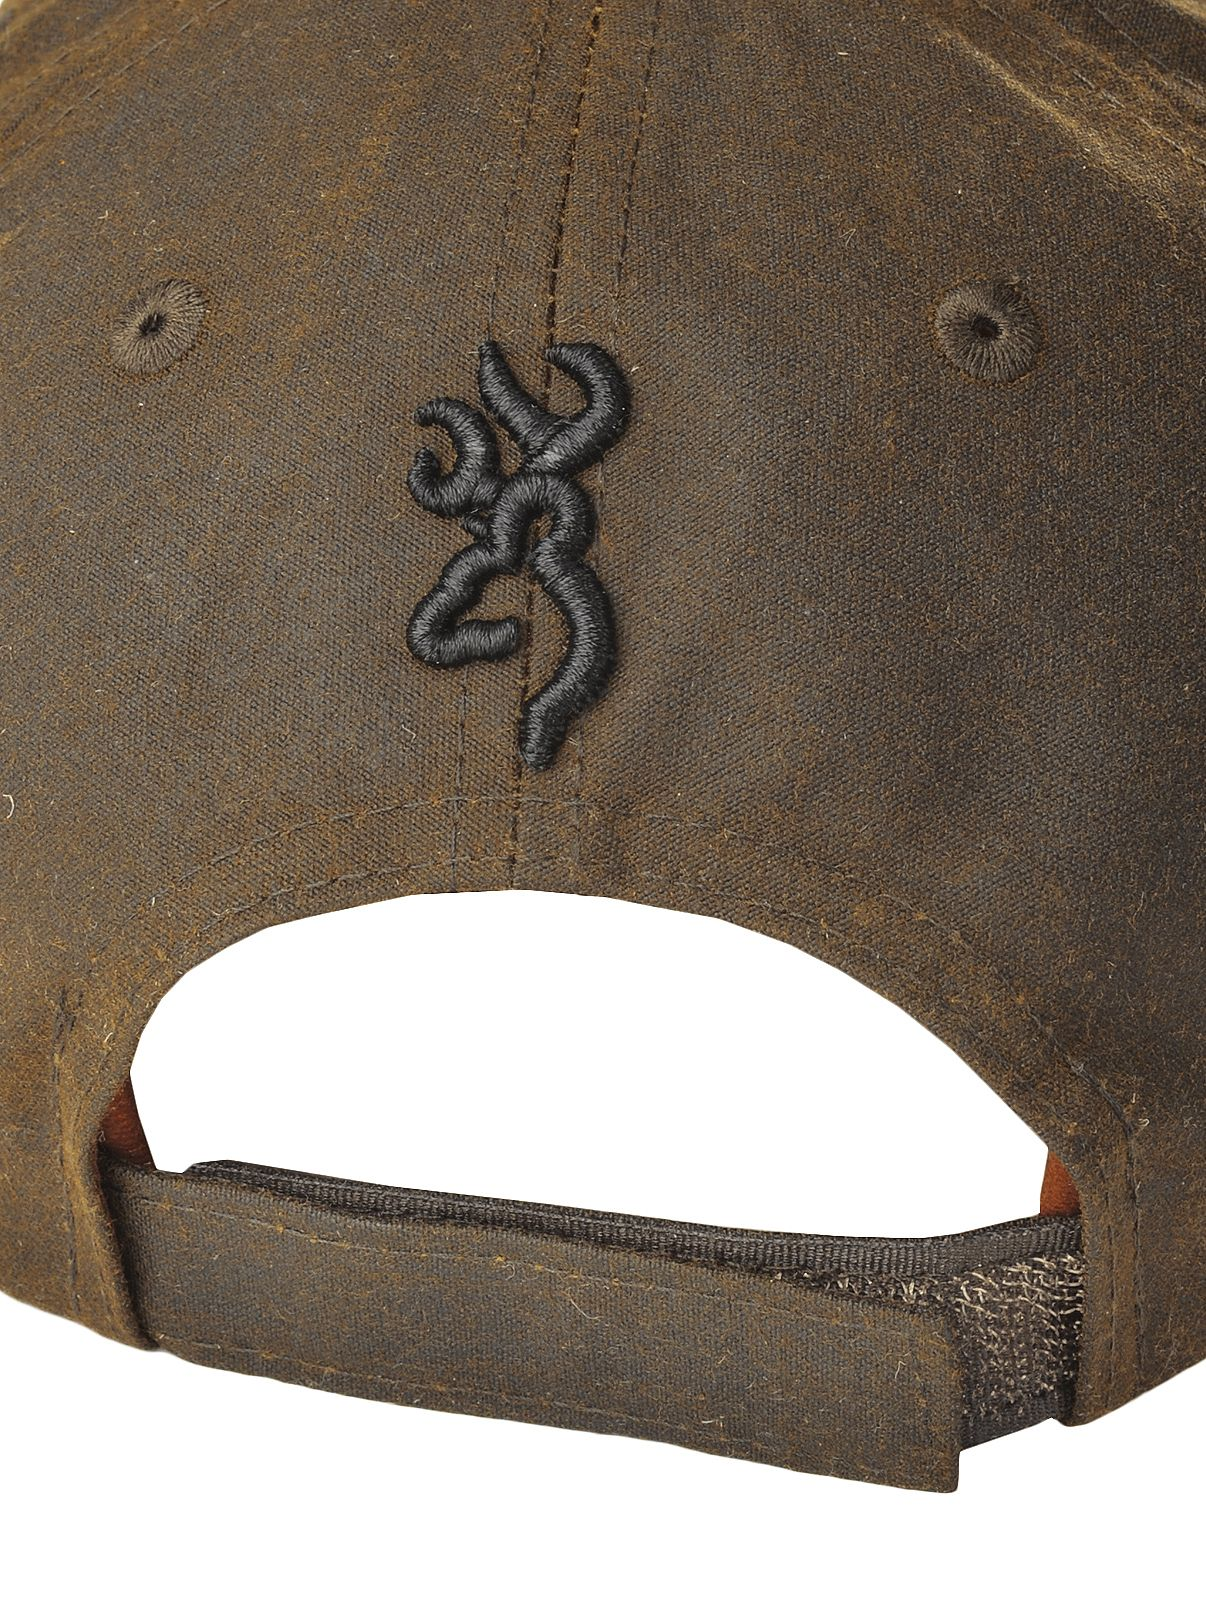 separation shoes 674c0 1713b ... denmark browning american flag buckmark logo cap brown hi res a5d51  04876